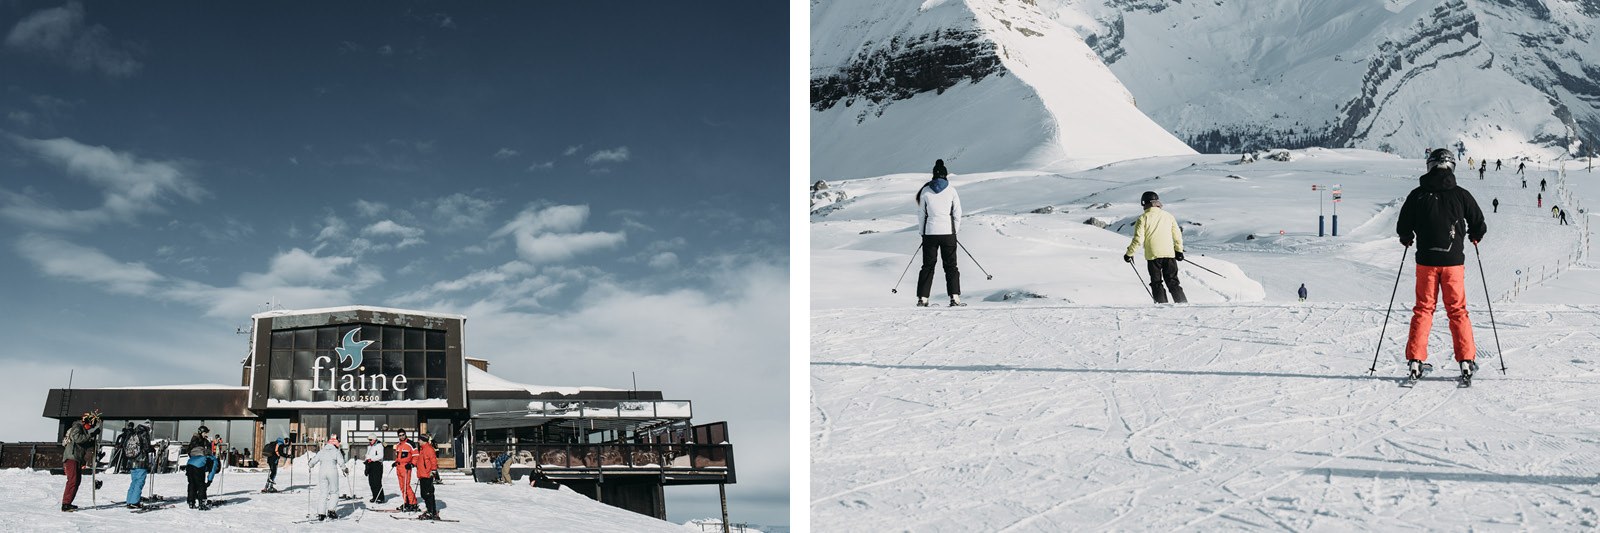 Evabloem_travel_wintersports_le-grande-massif-0009a.jpg